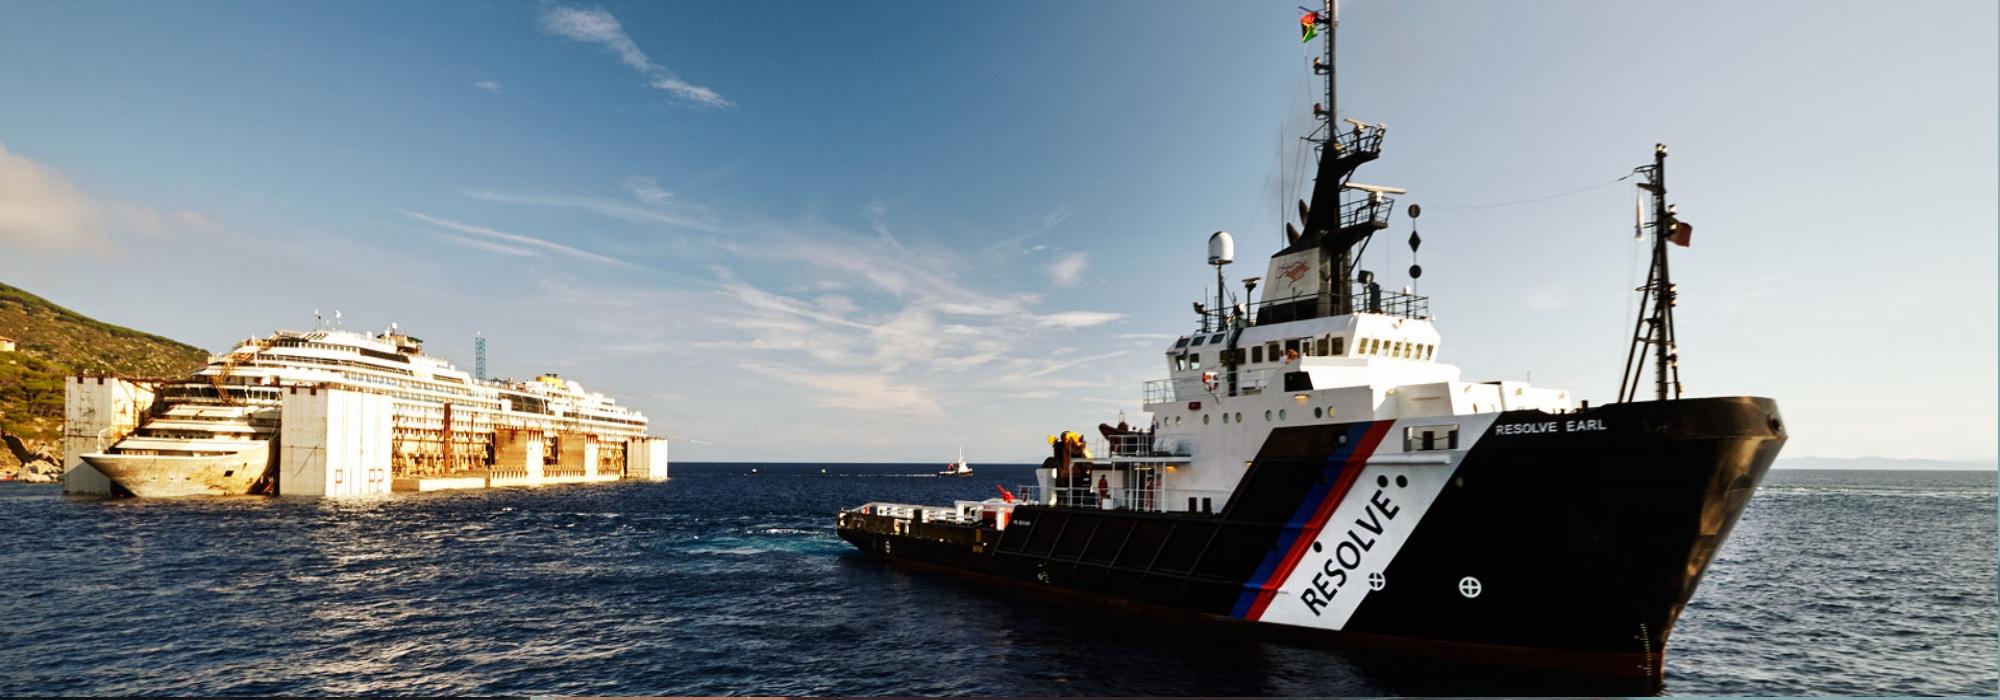 vessel-4